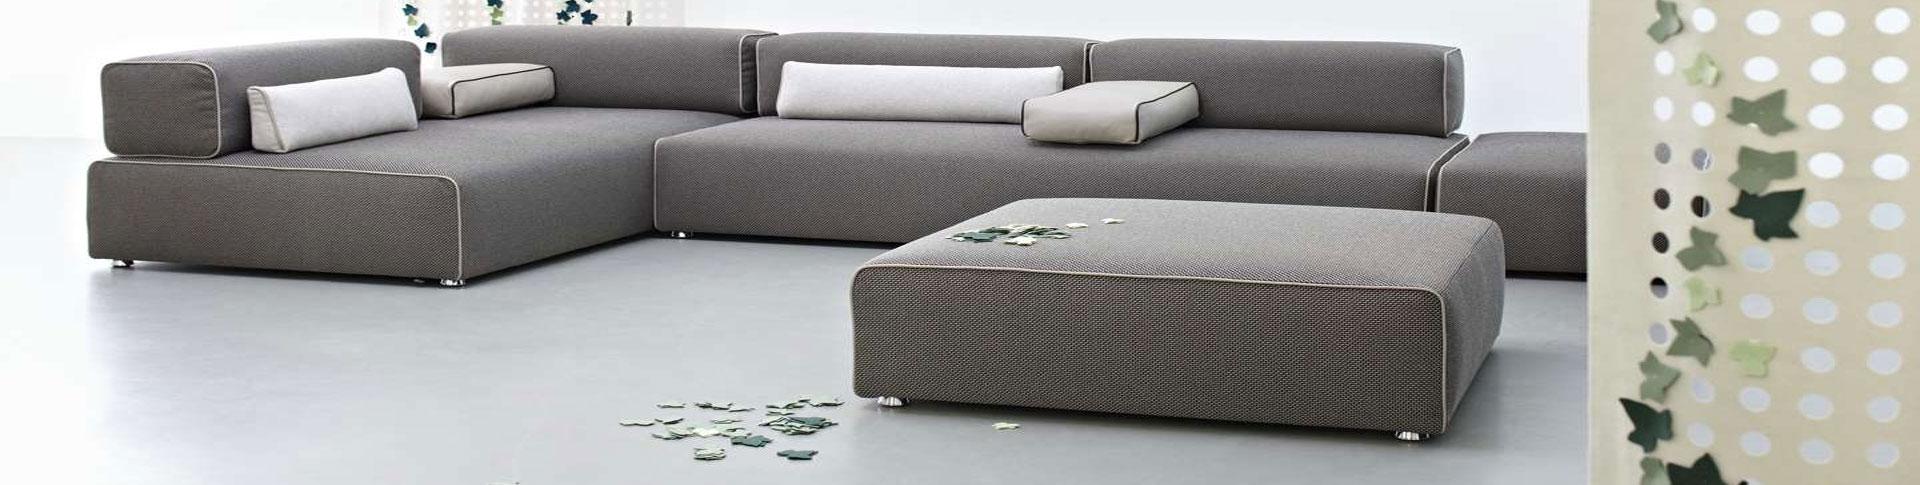 foam for sofa india best bed hong kong companies factory pu fr sheet mattress manufacturers in